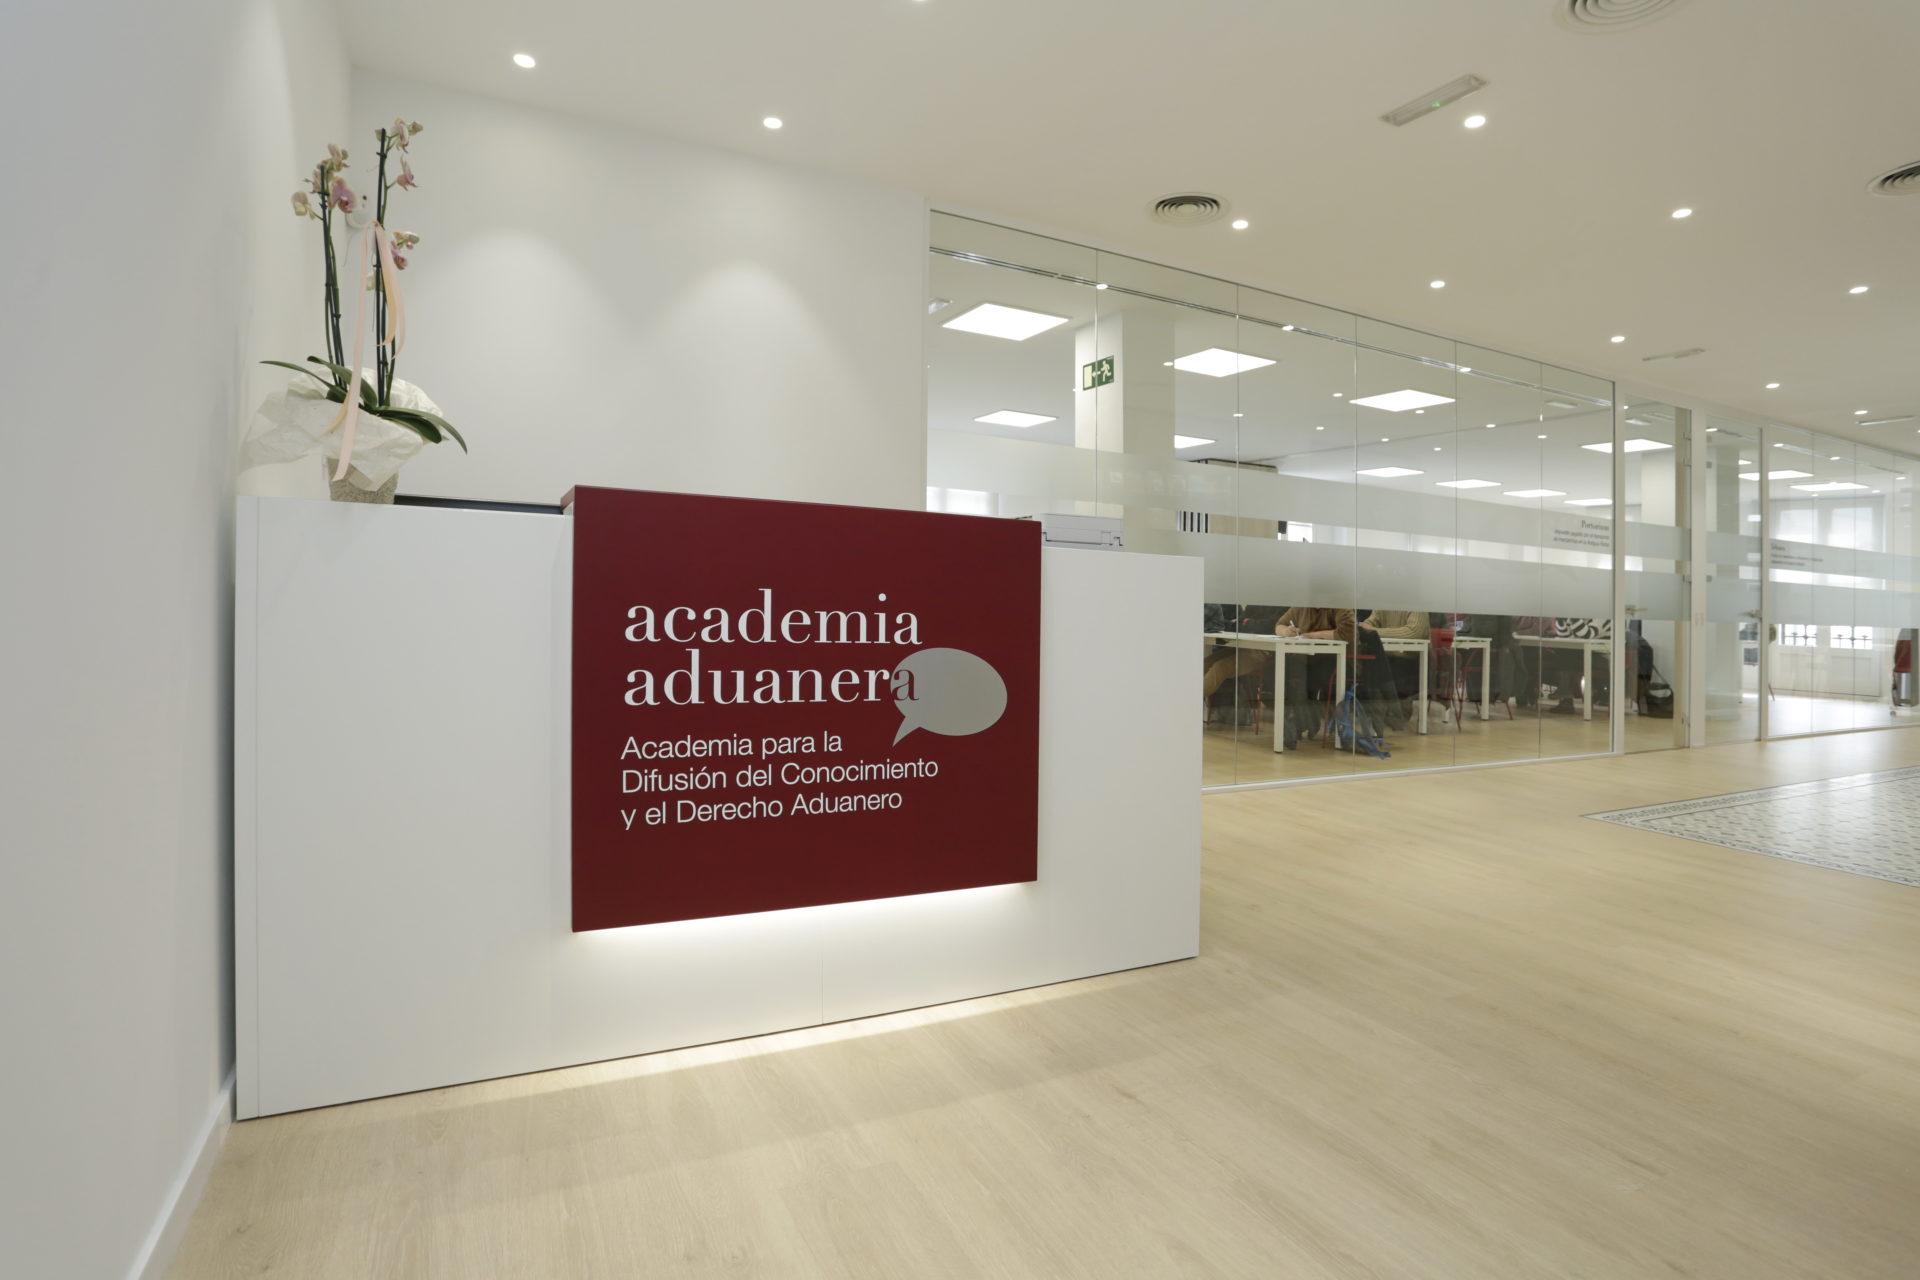 Academia Aduanera